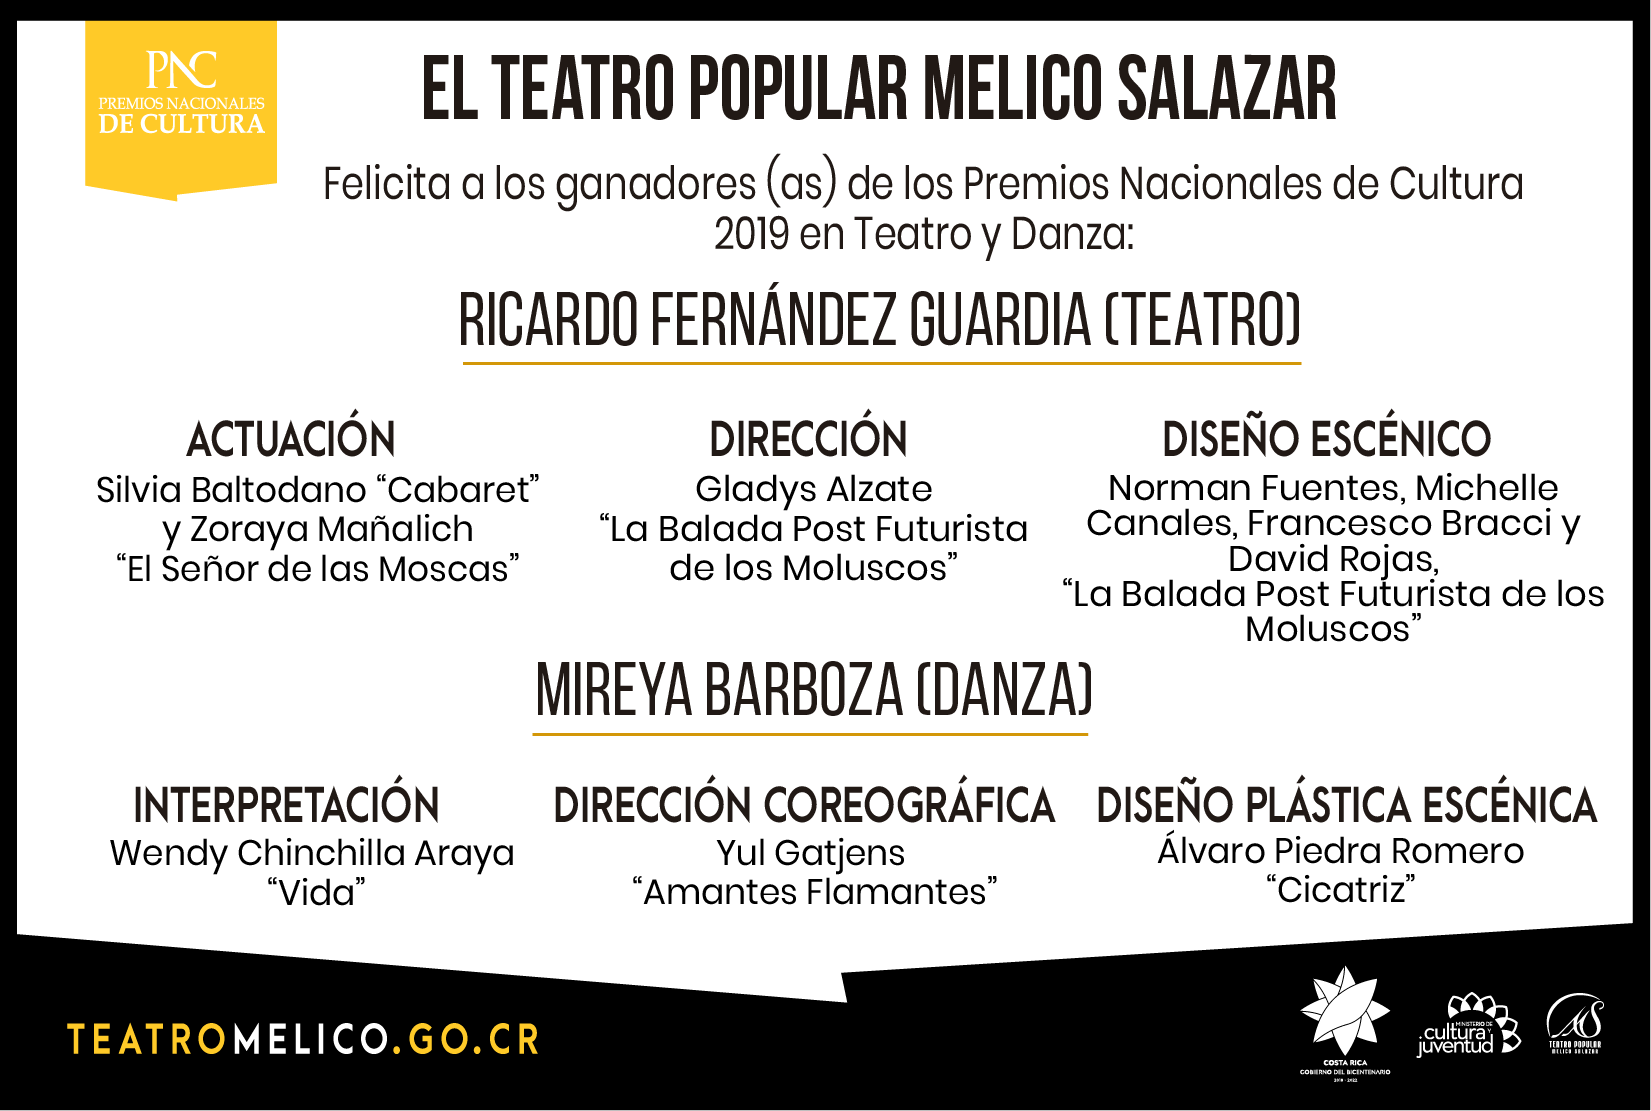 https://teatromelico.go.cr/images/50d3cd01da910285c16715fac245c28d.png